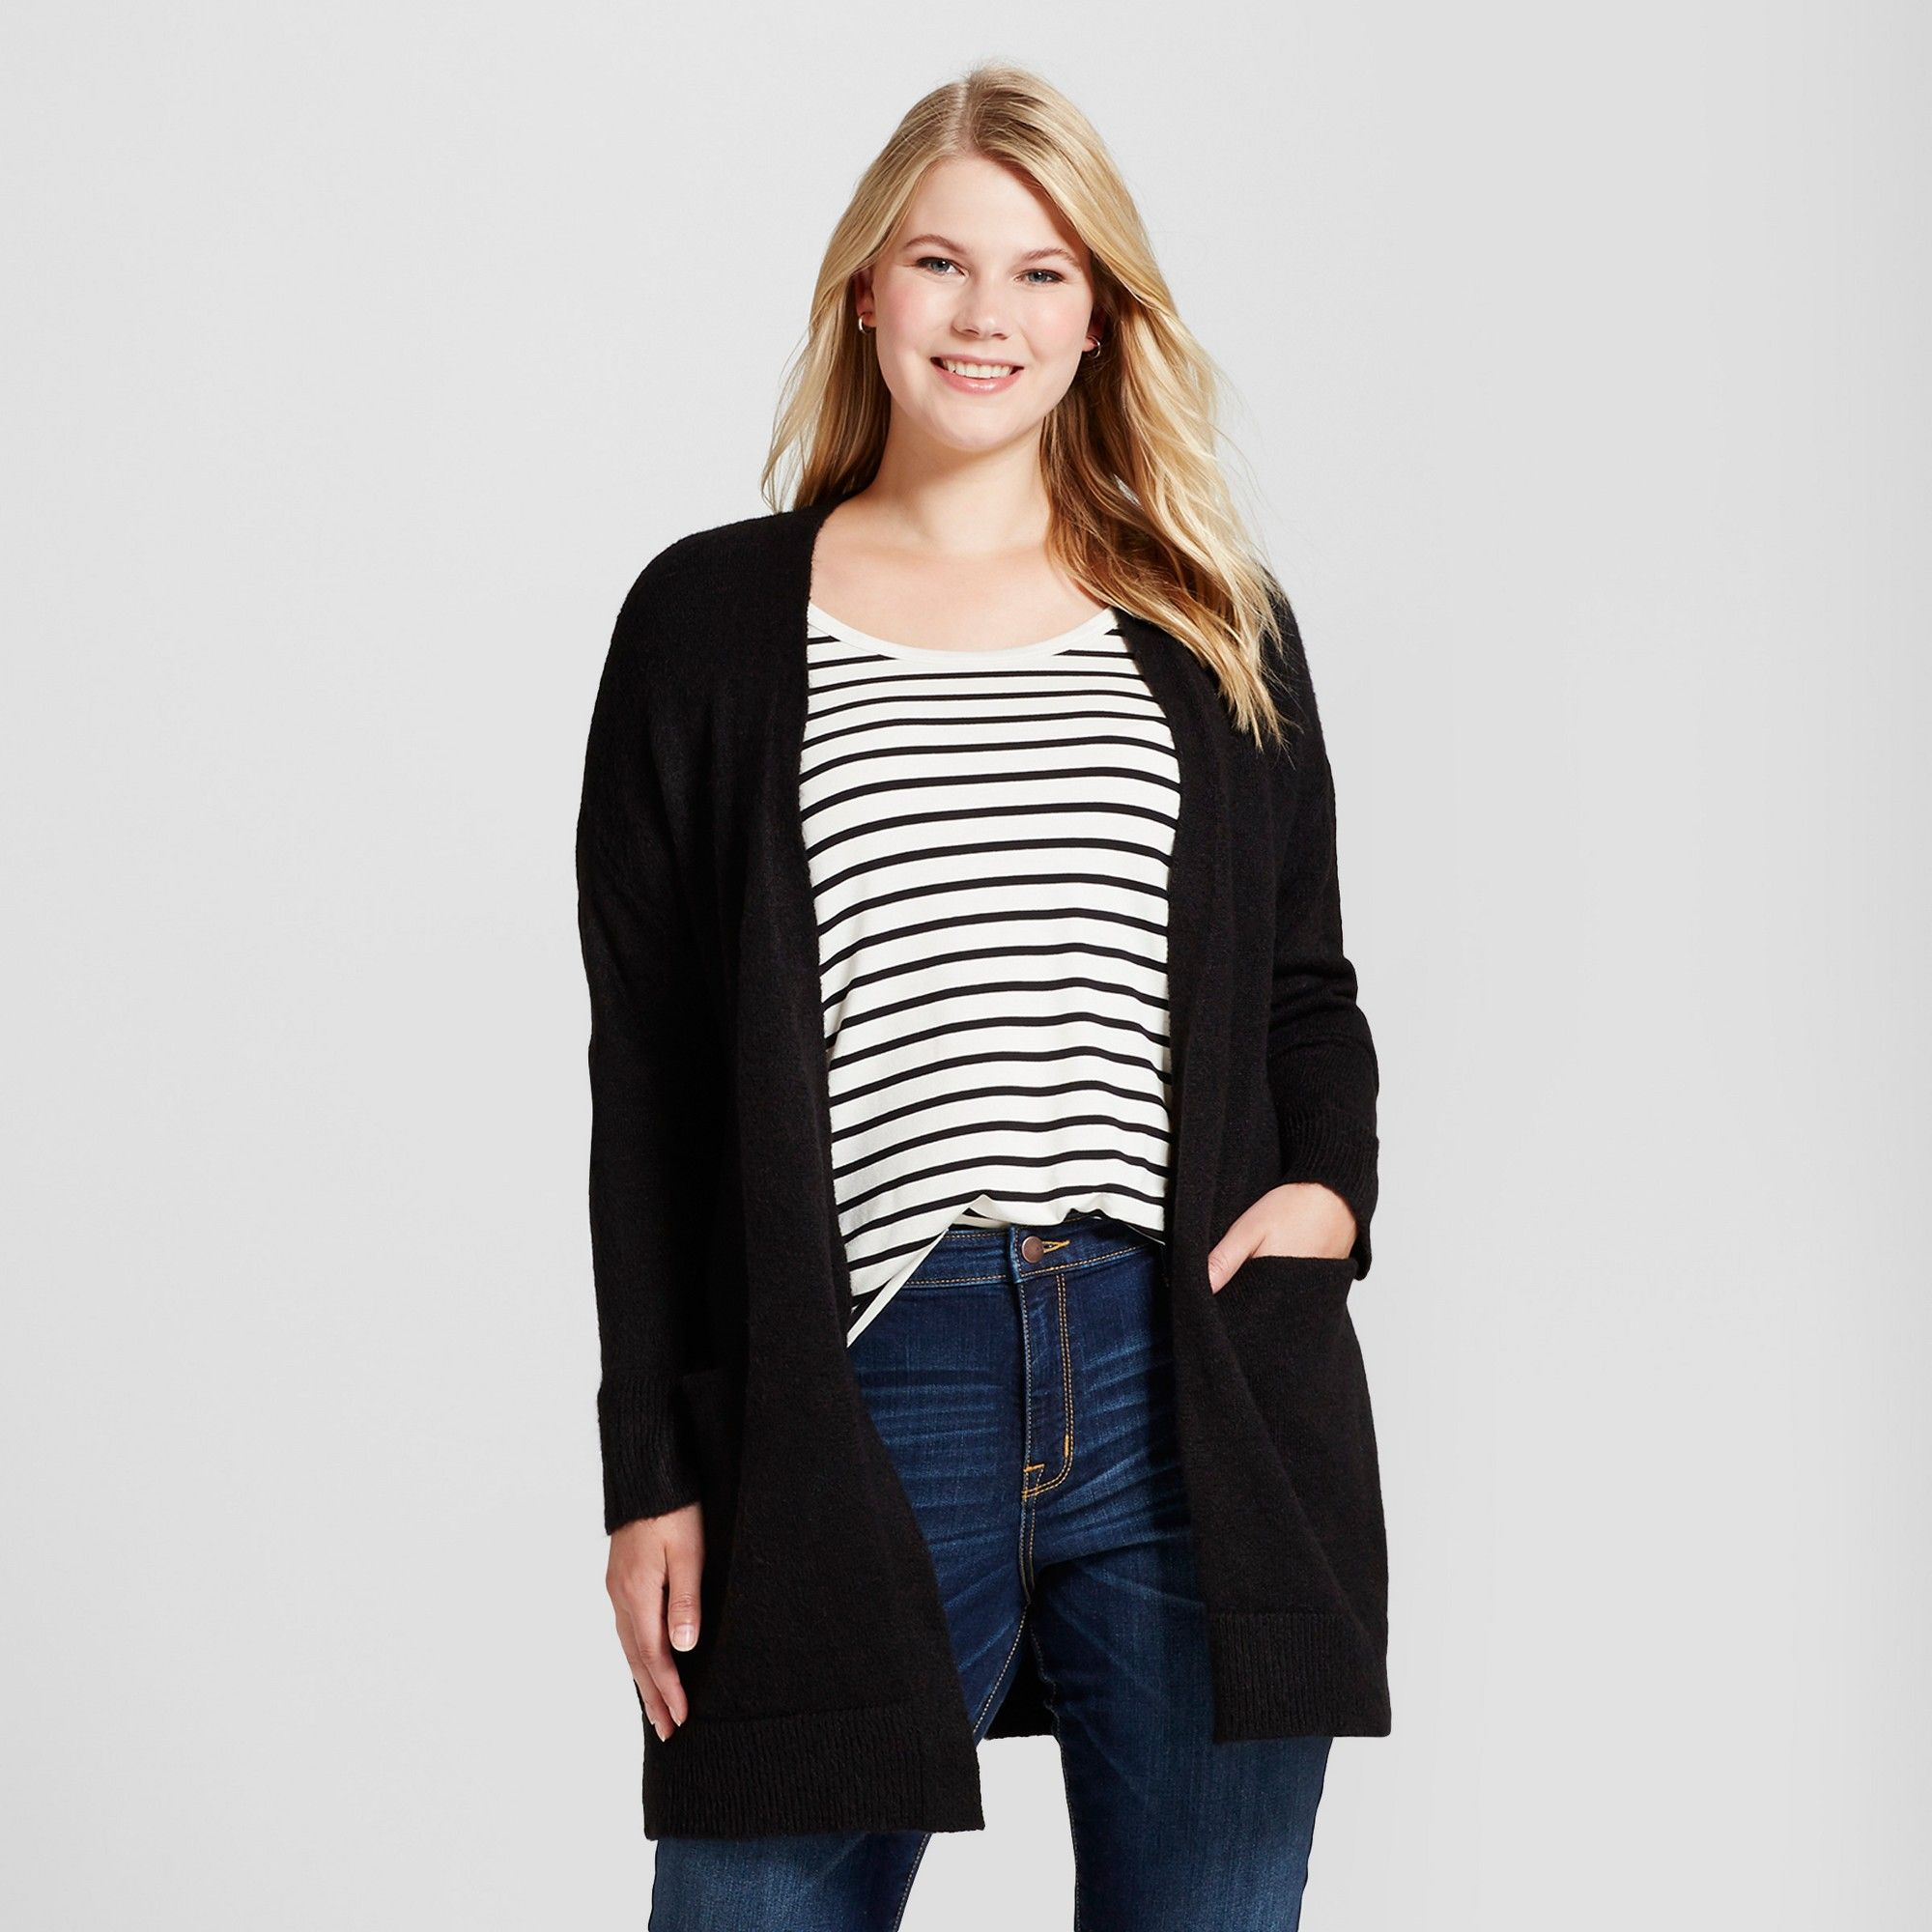 bad1ceec34 Women's Plus Size Cozy Cardigan - Ava & Viv Black 2X | Products ...